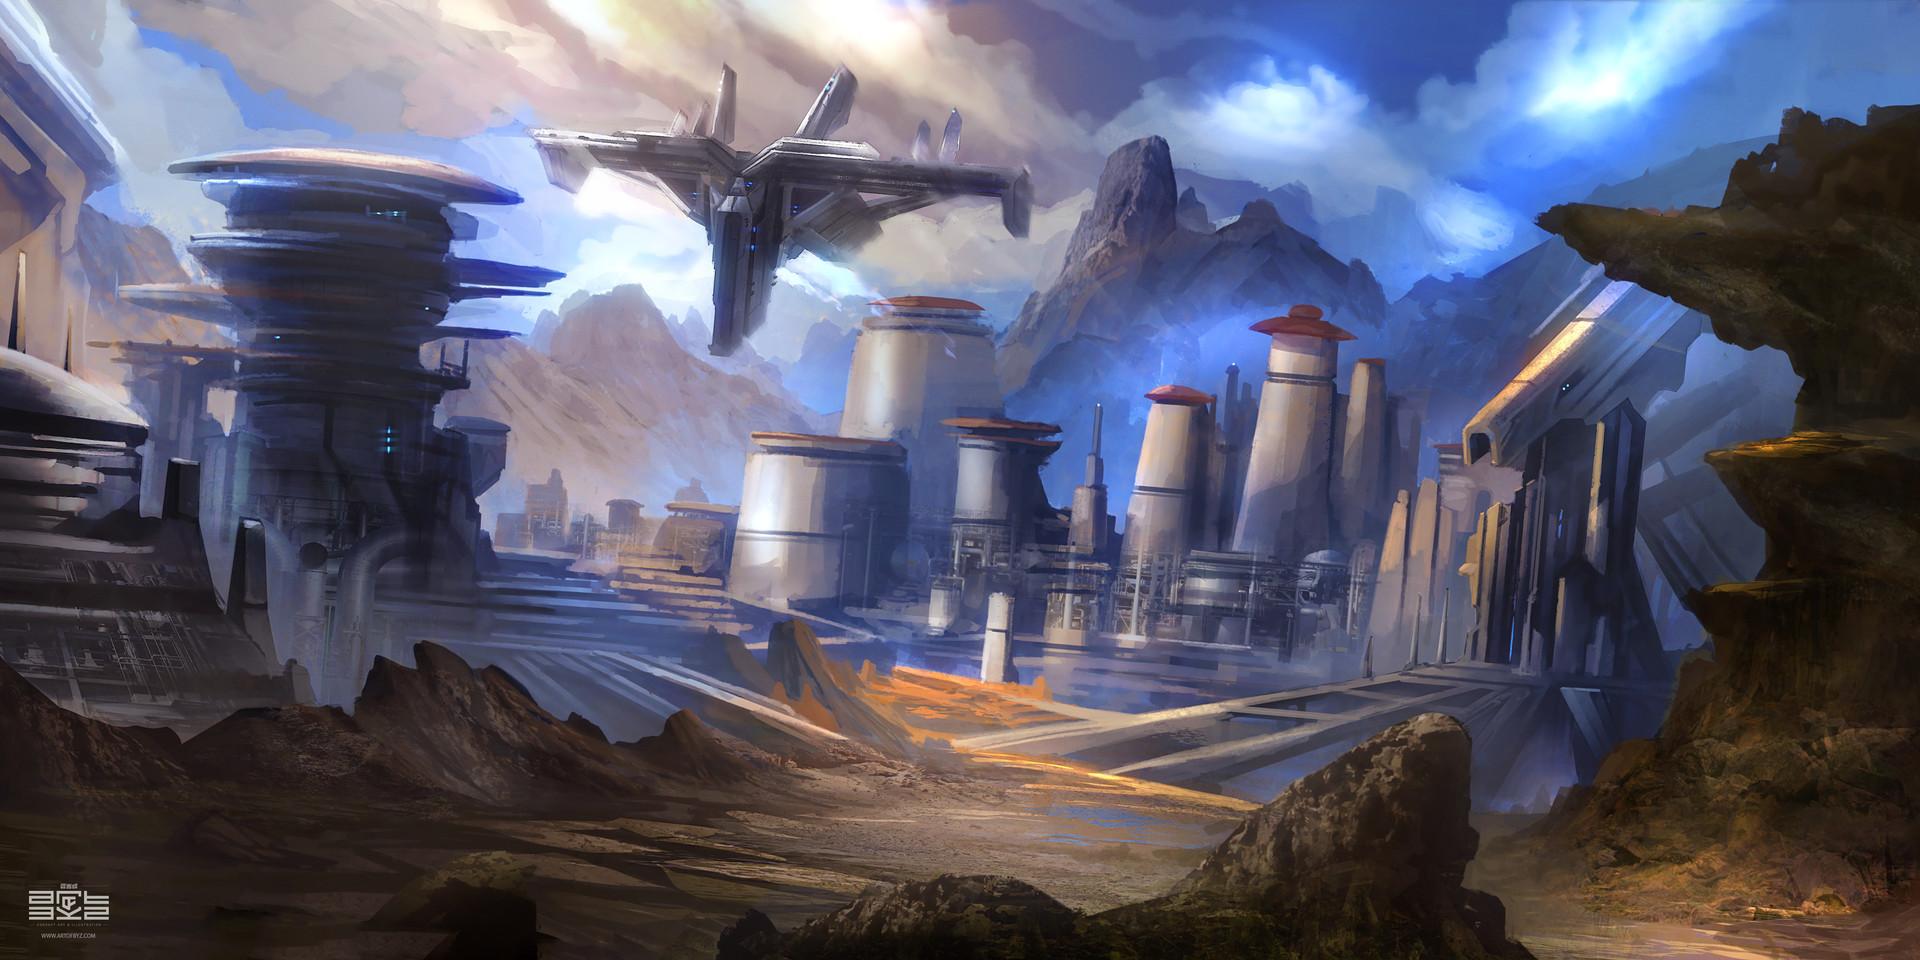 Environment Concept Art Sci Fi